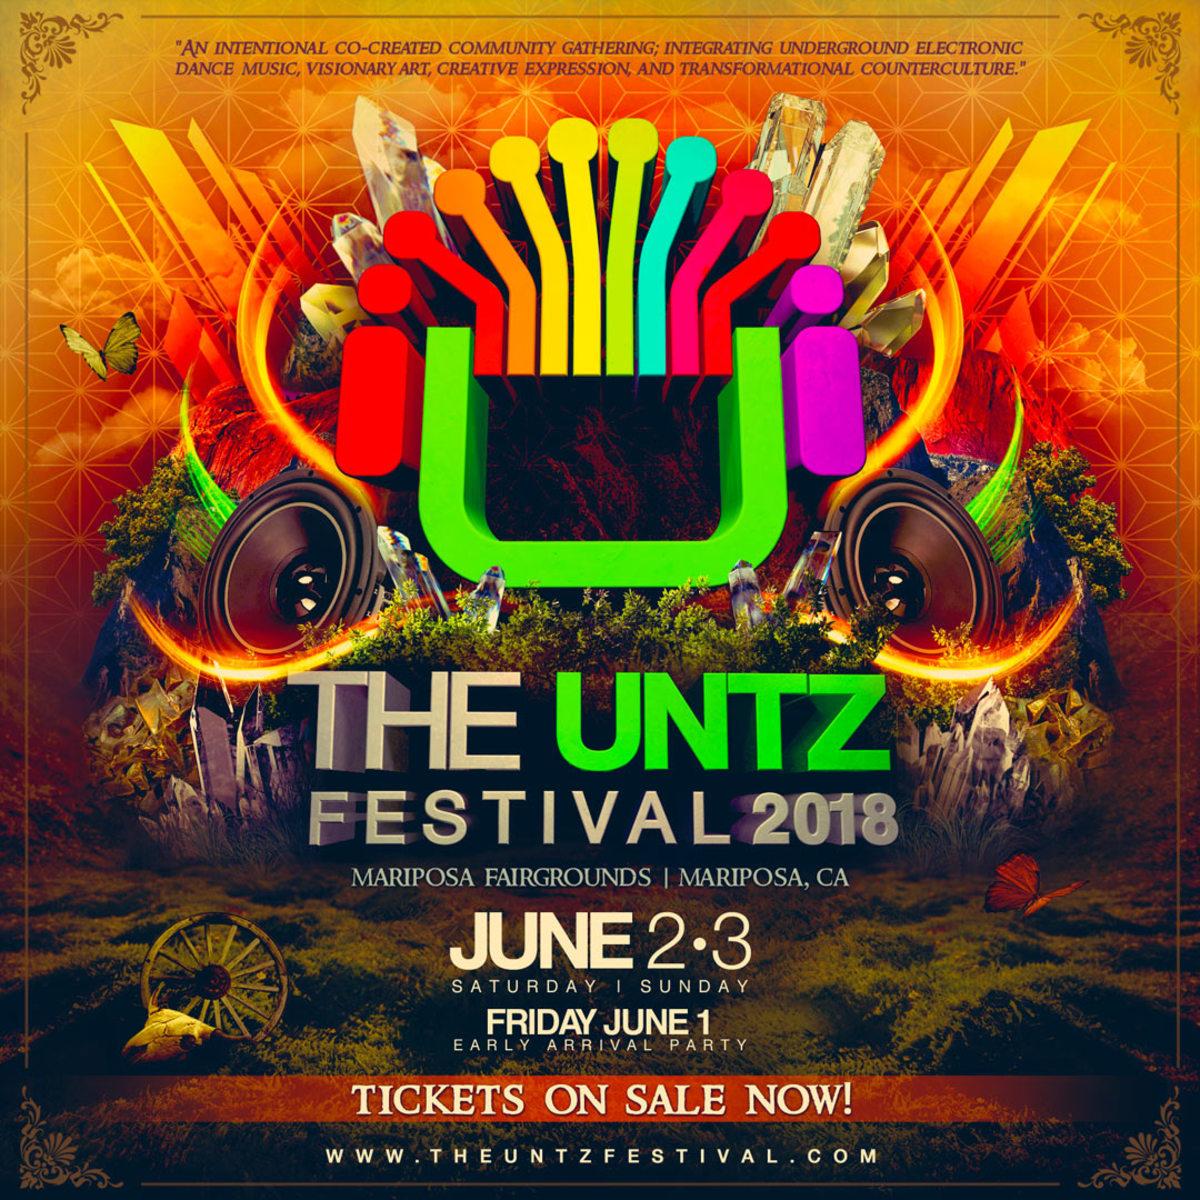 The Untz Festival 2020 In Mariposa, CA